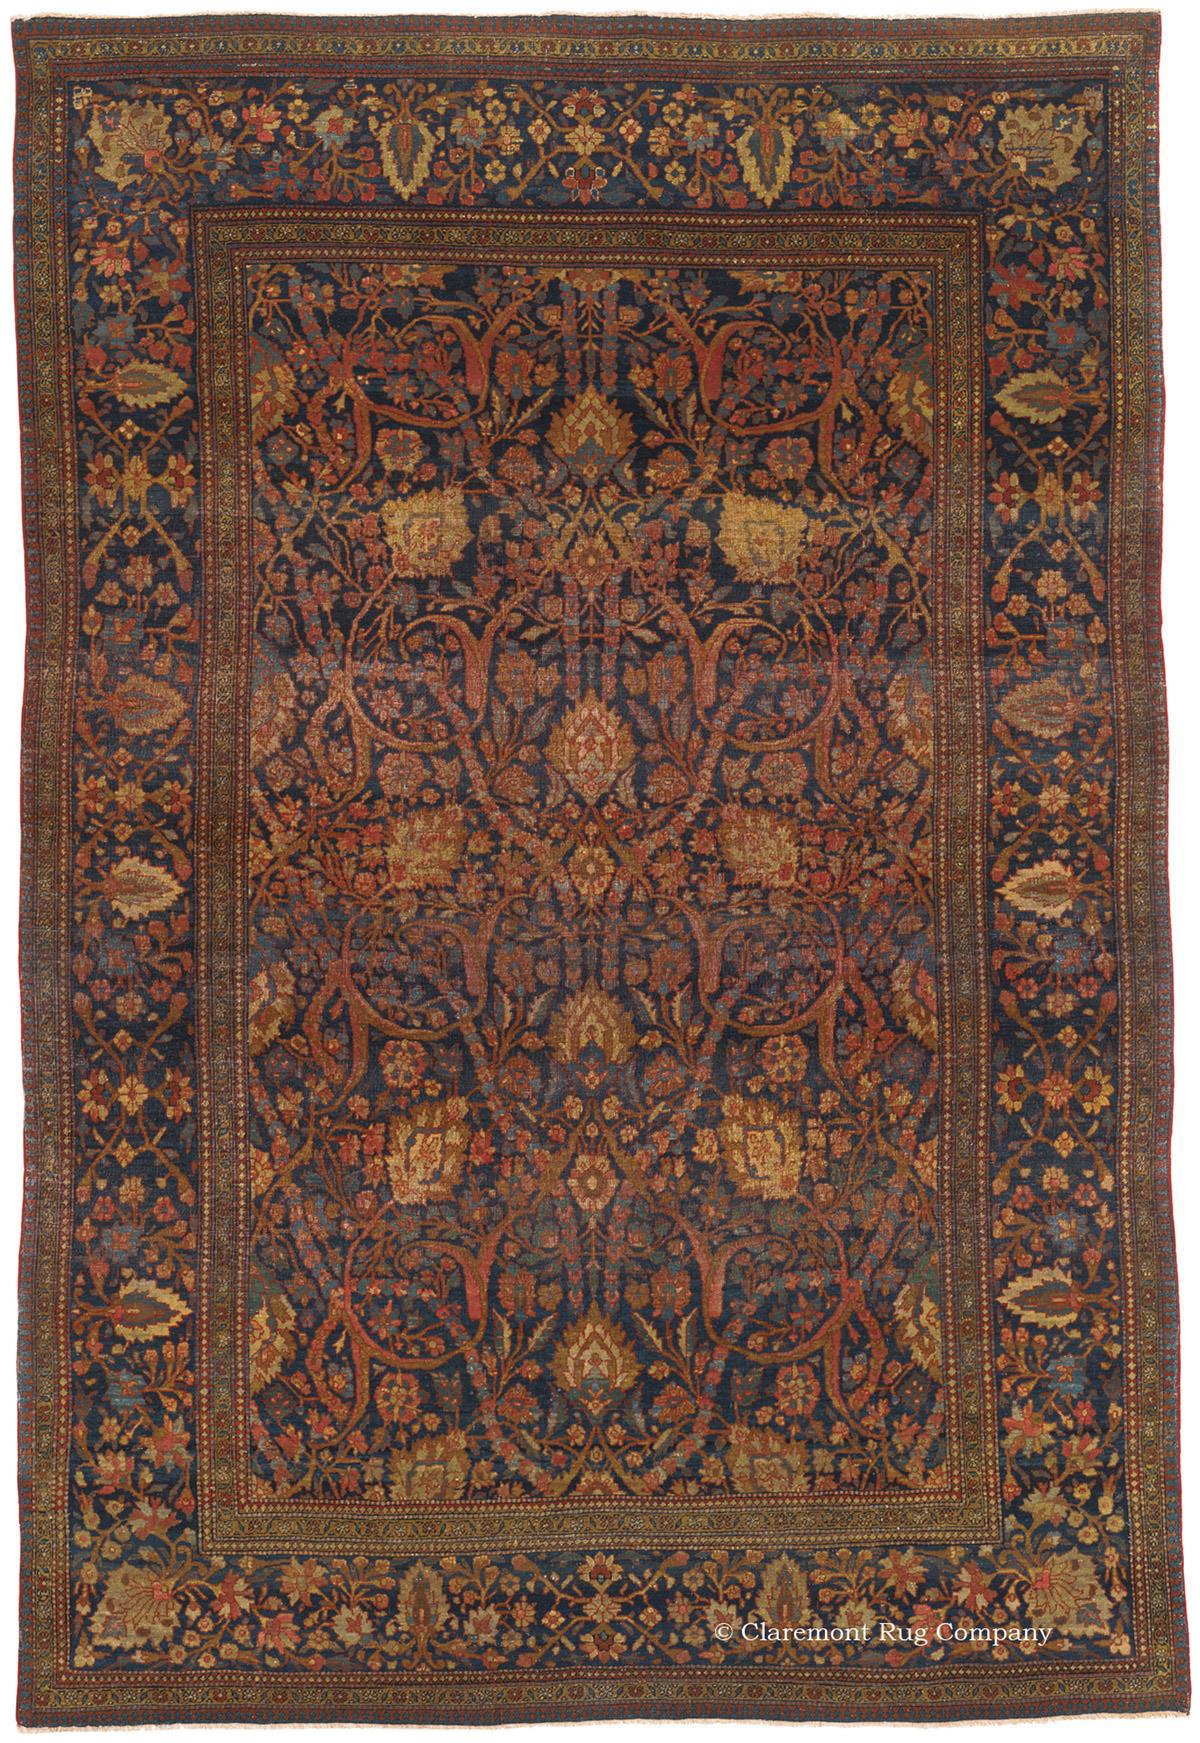 Antique Mohtasham Kashan Carpets From